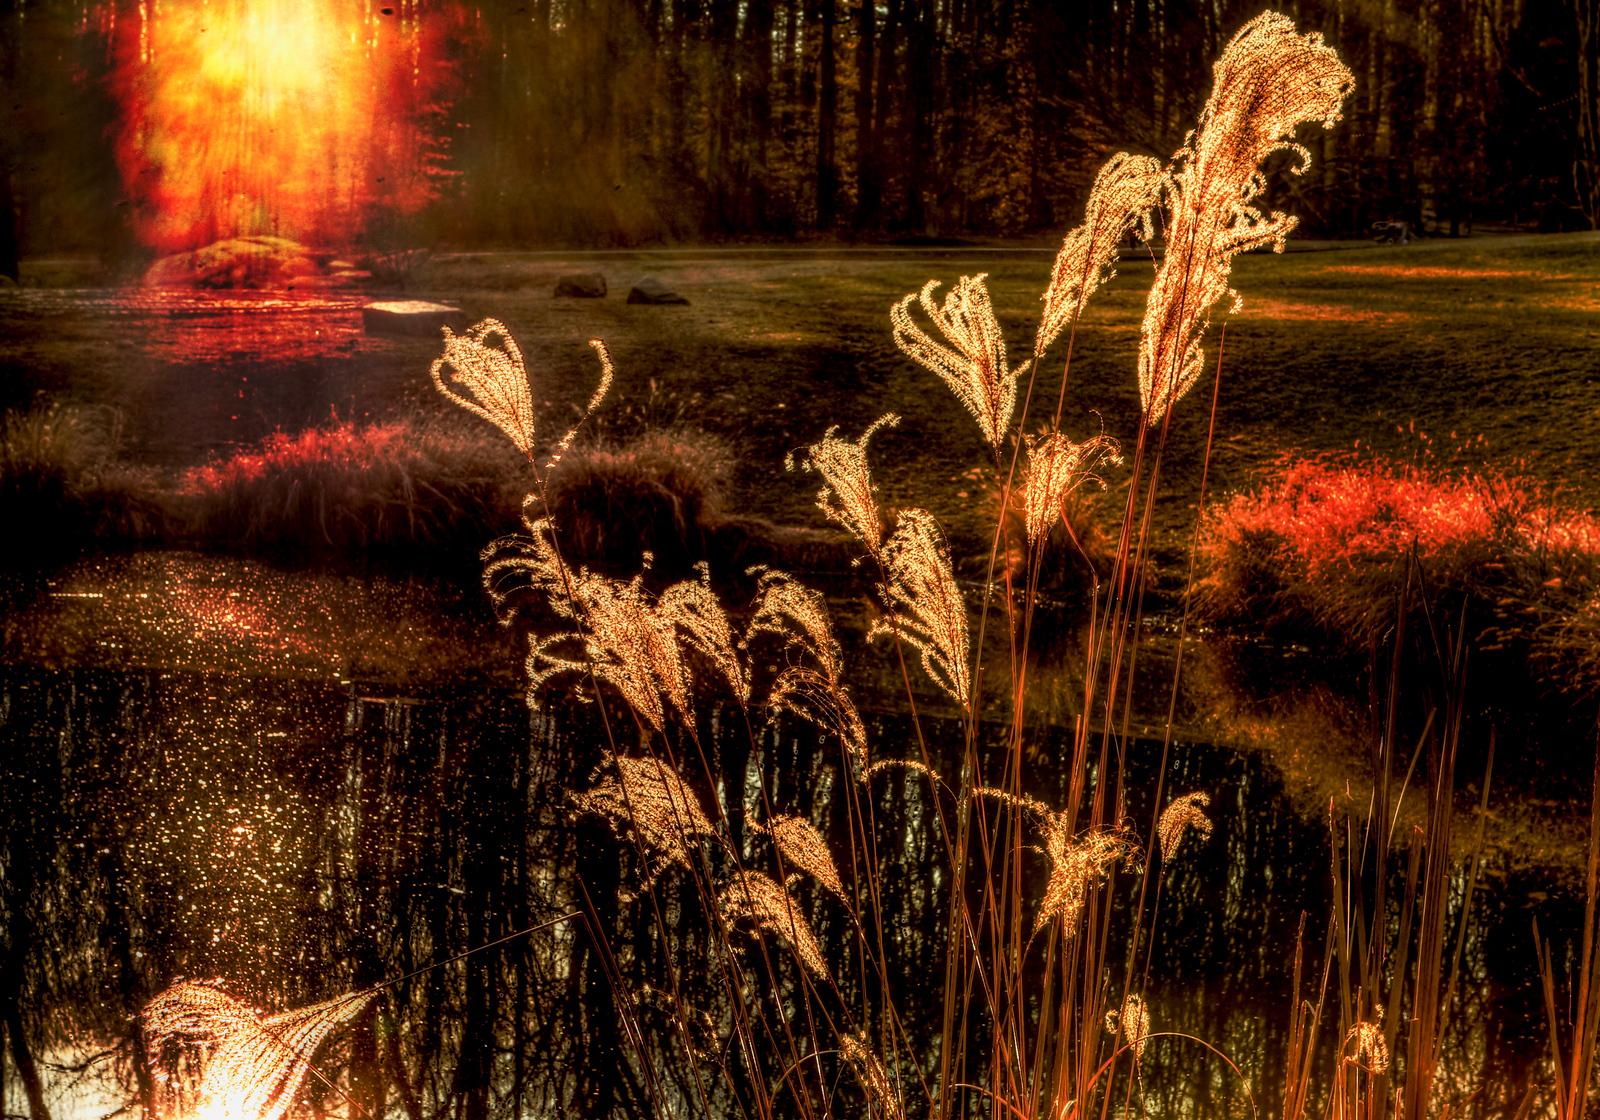 Blazing reeds